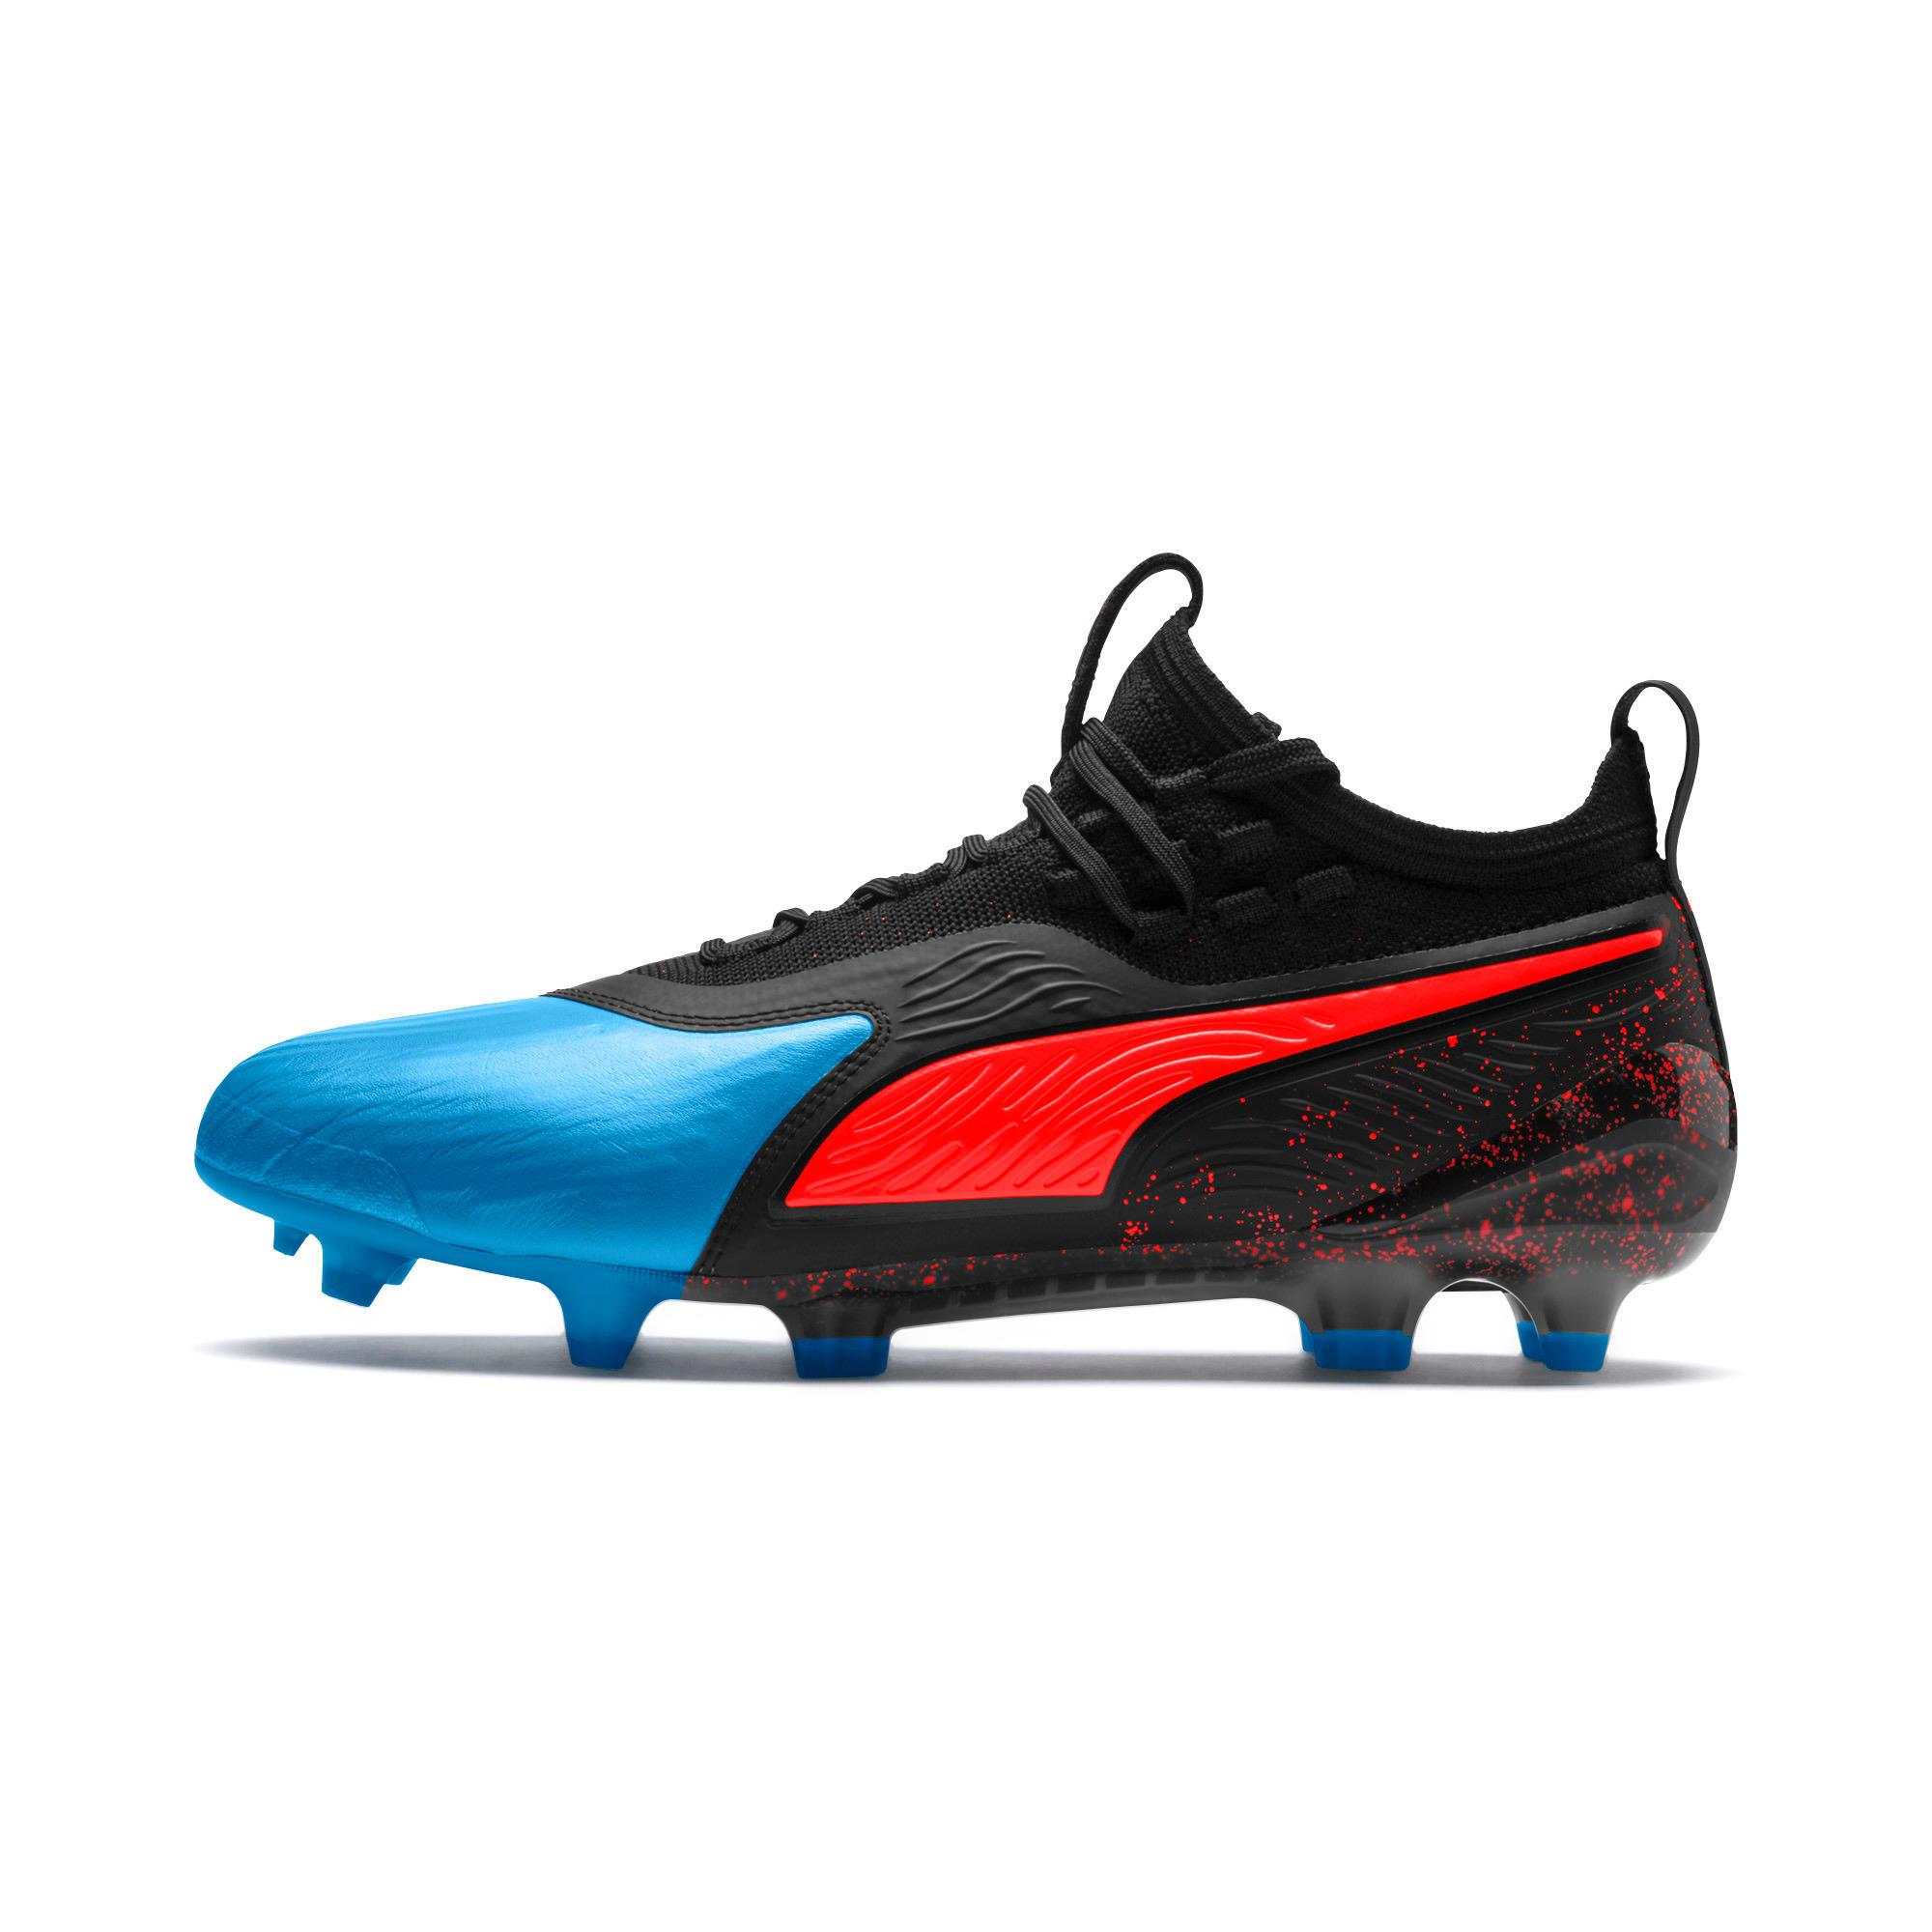 Thumbnail 1 of PUMA ONE 19.1 evoKNIT FG/AG Men's Football Boots, Bleu Azur-Red Blast-Black, medium-IND